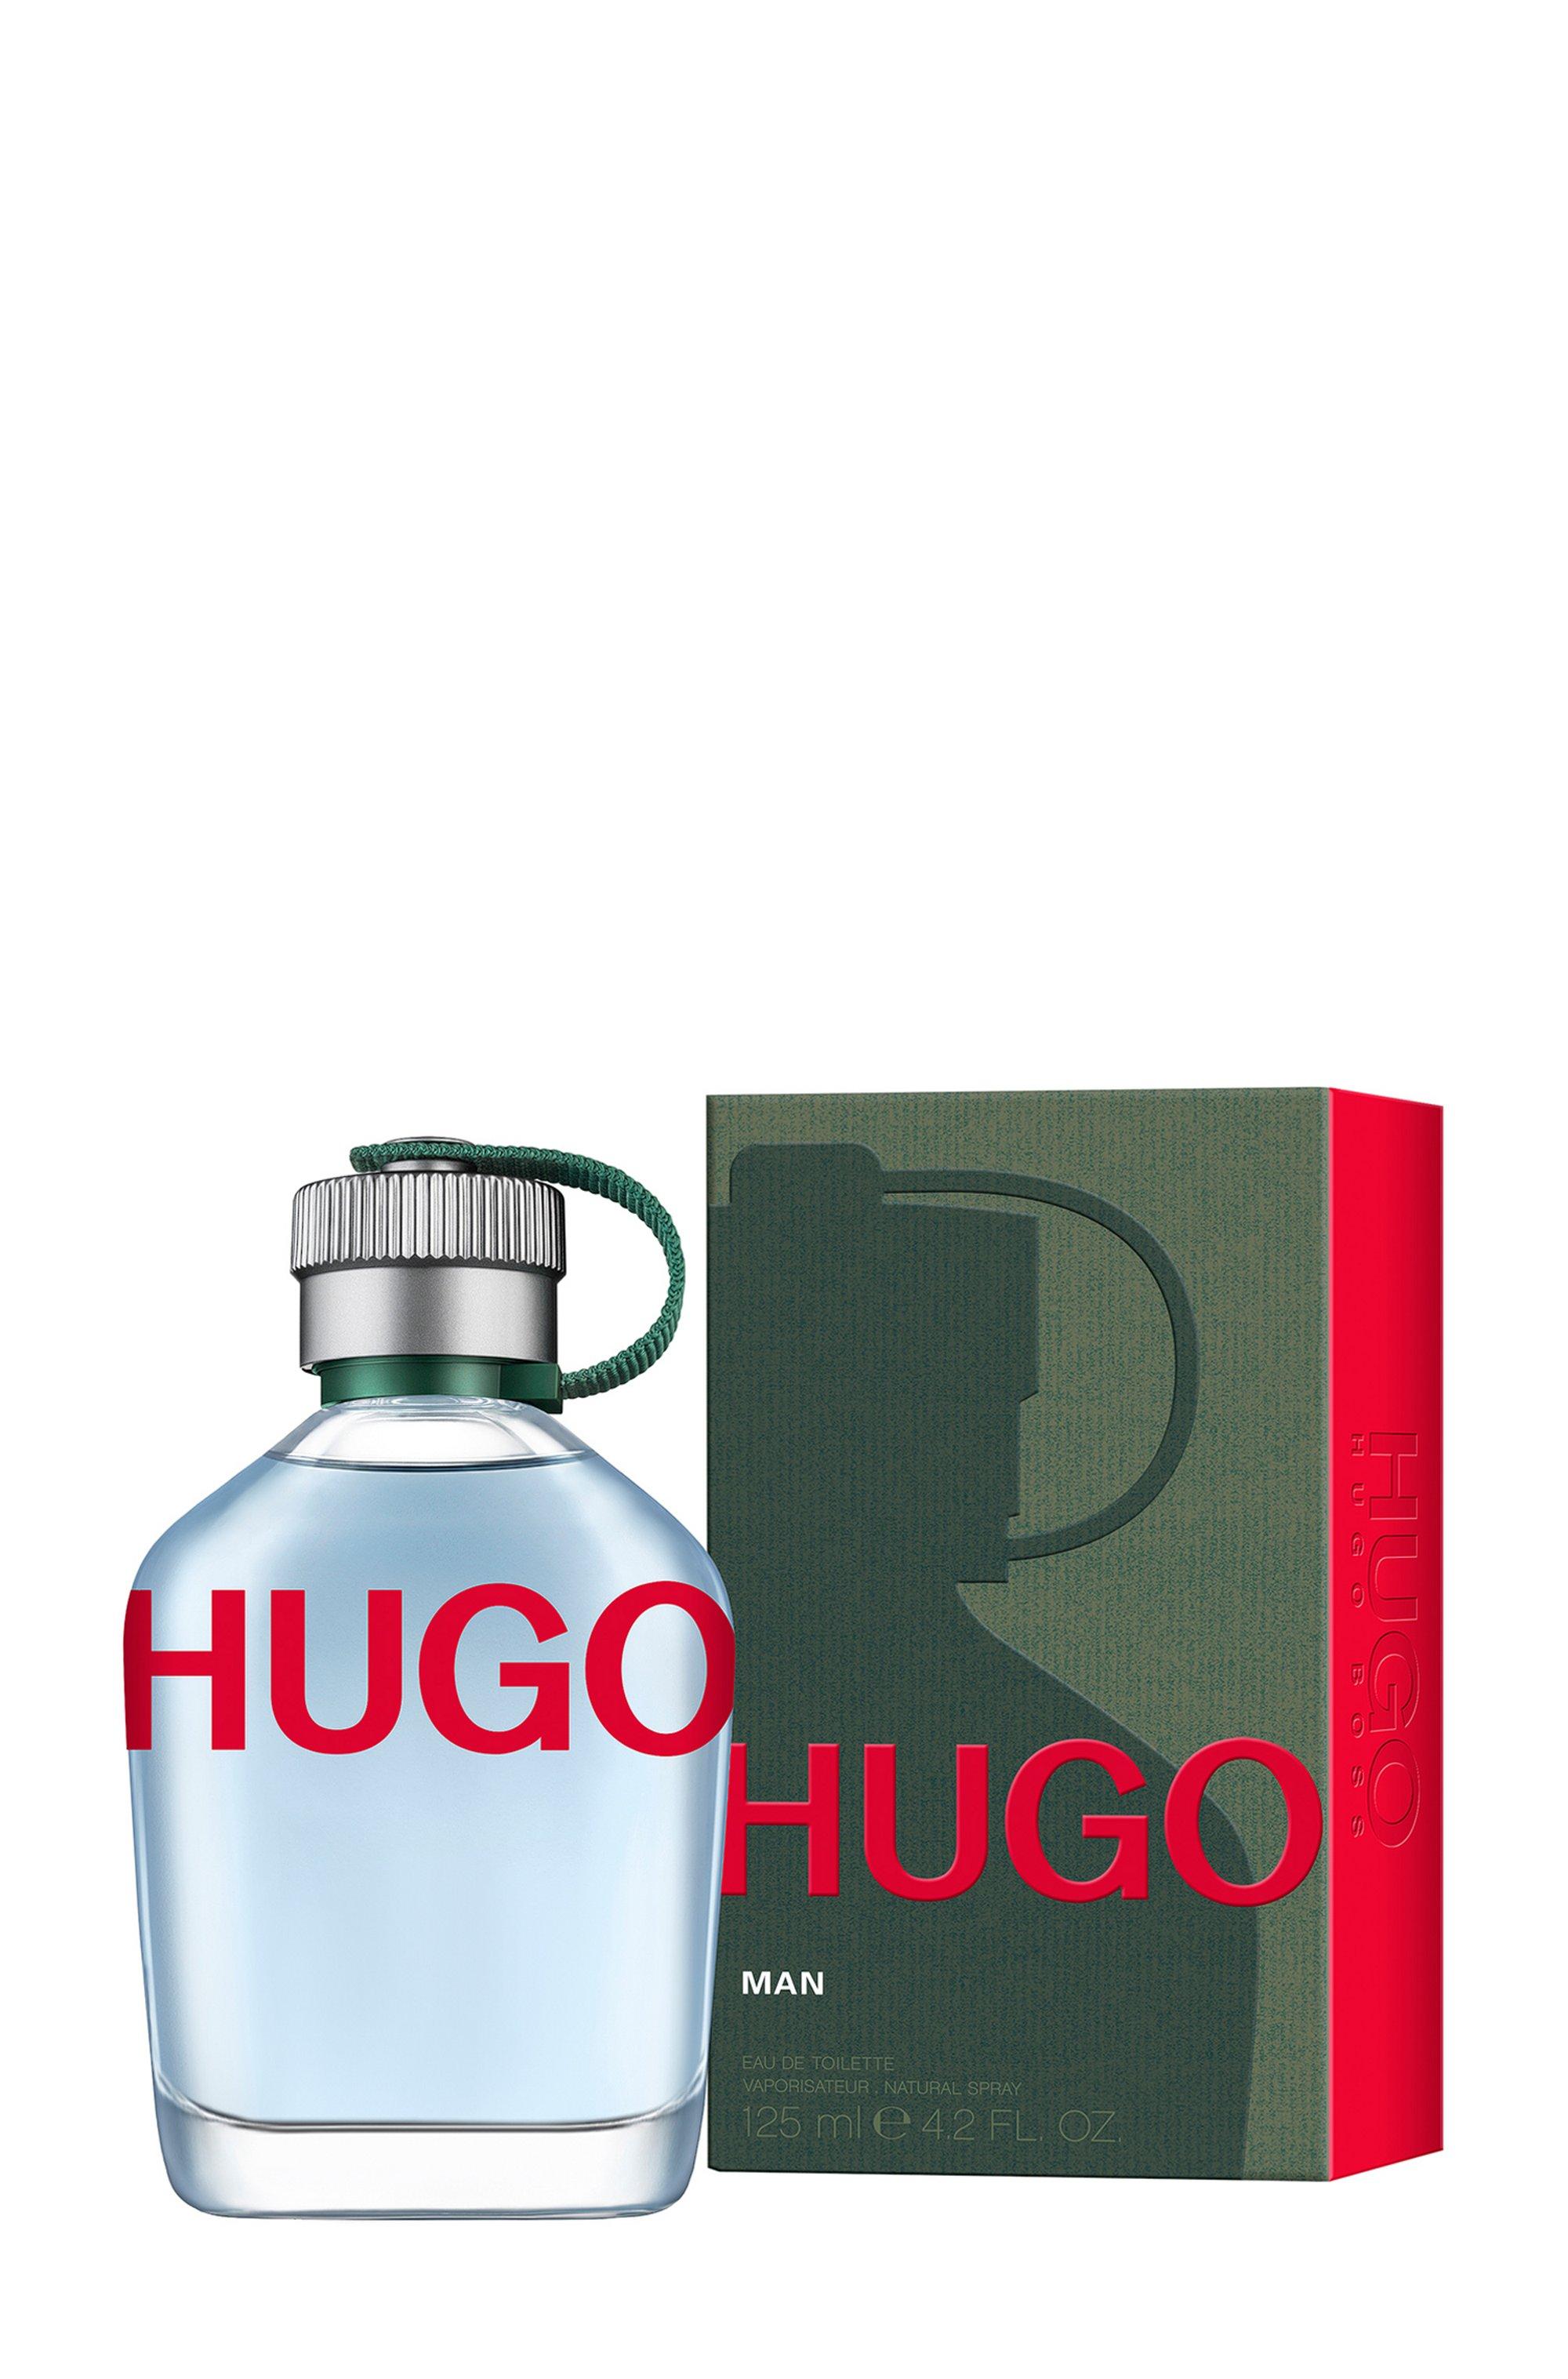 HUGO Man eau de toilette 125ml, Assorted-Pre-Pack